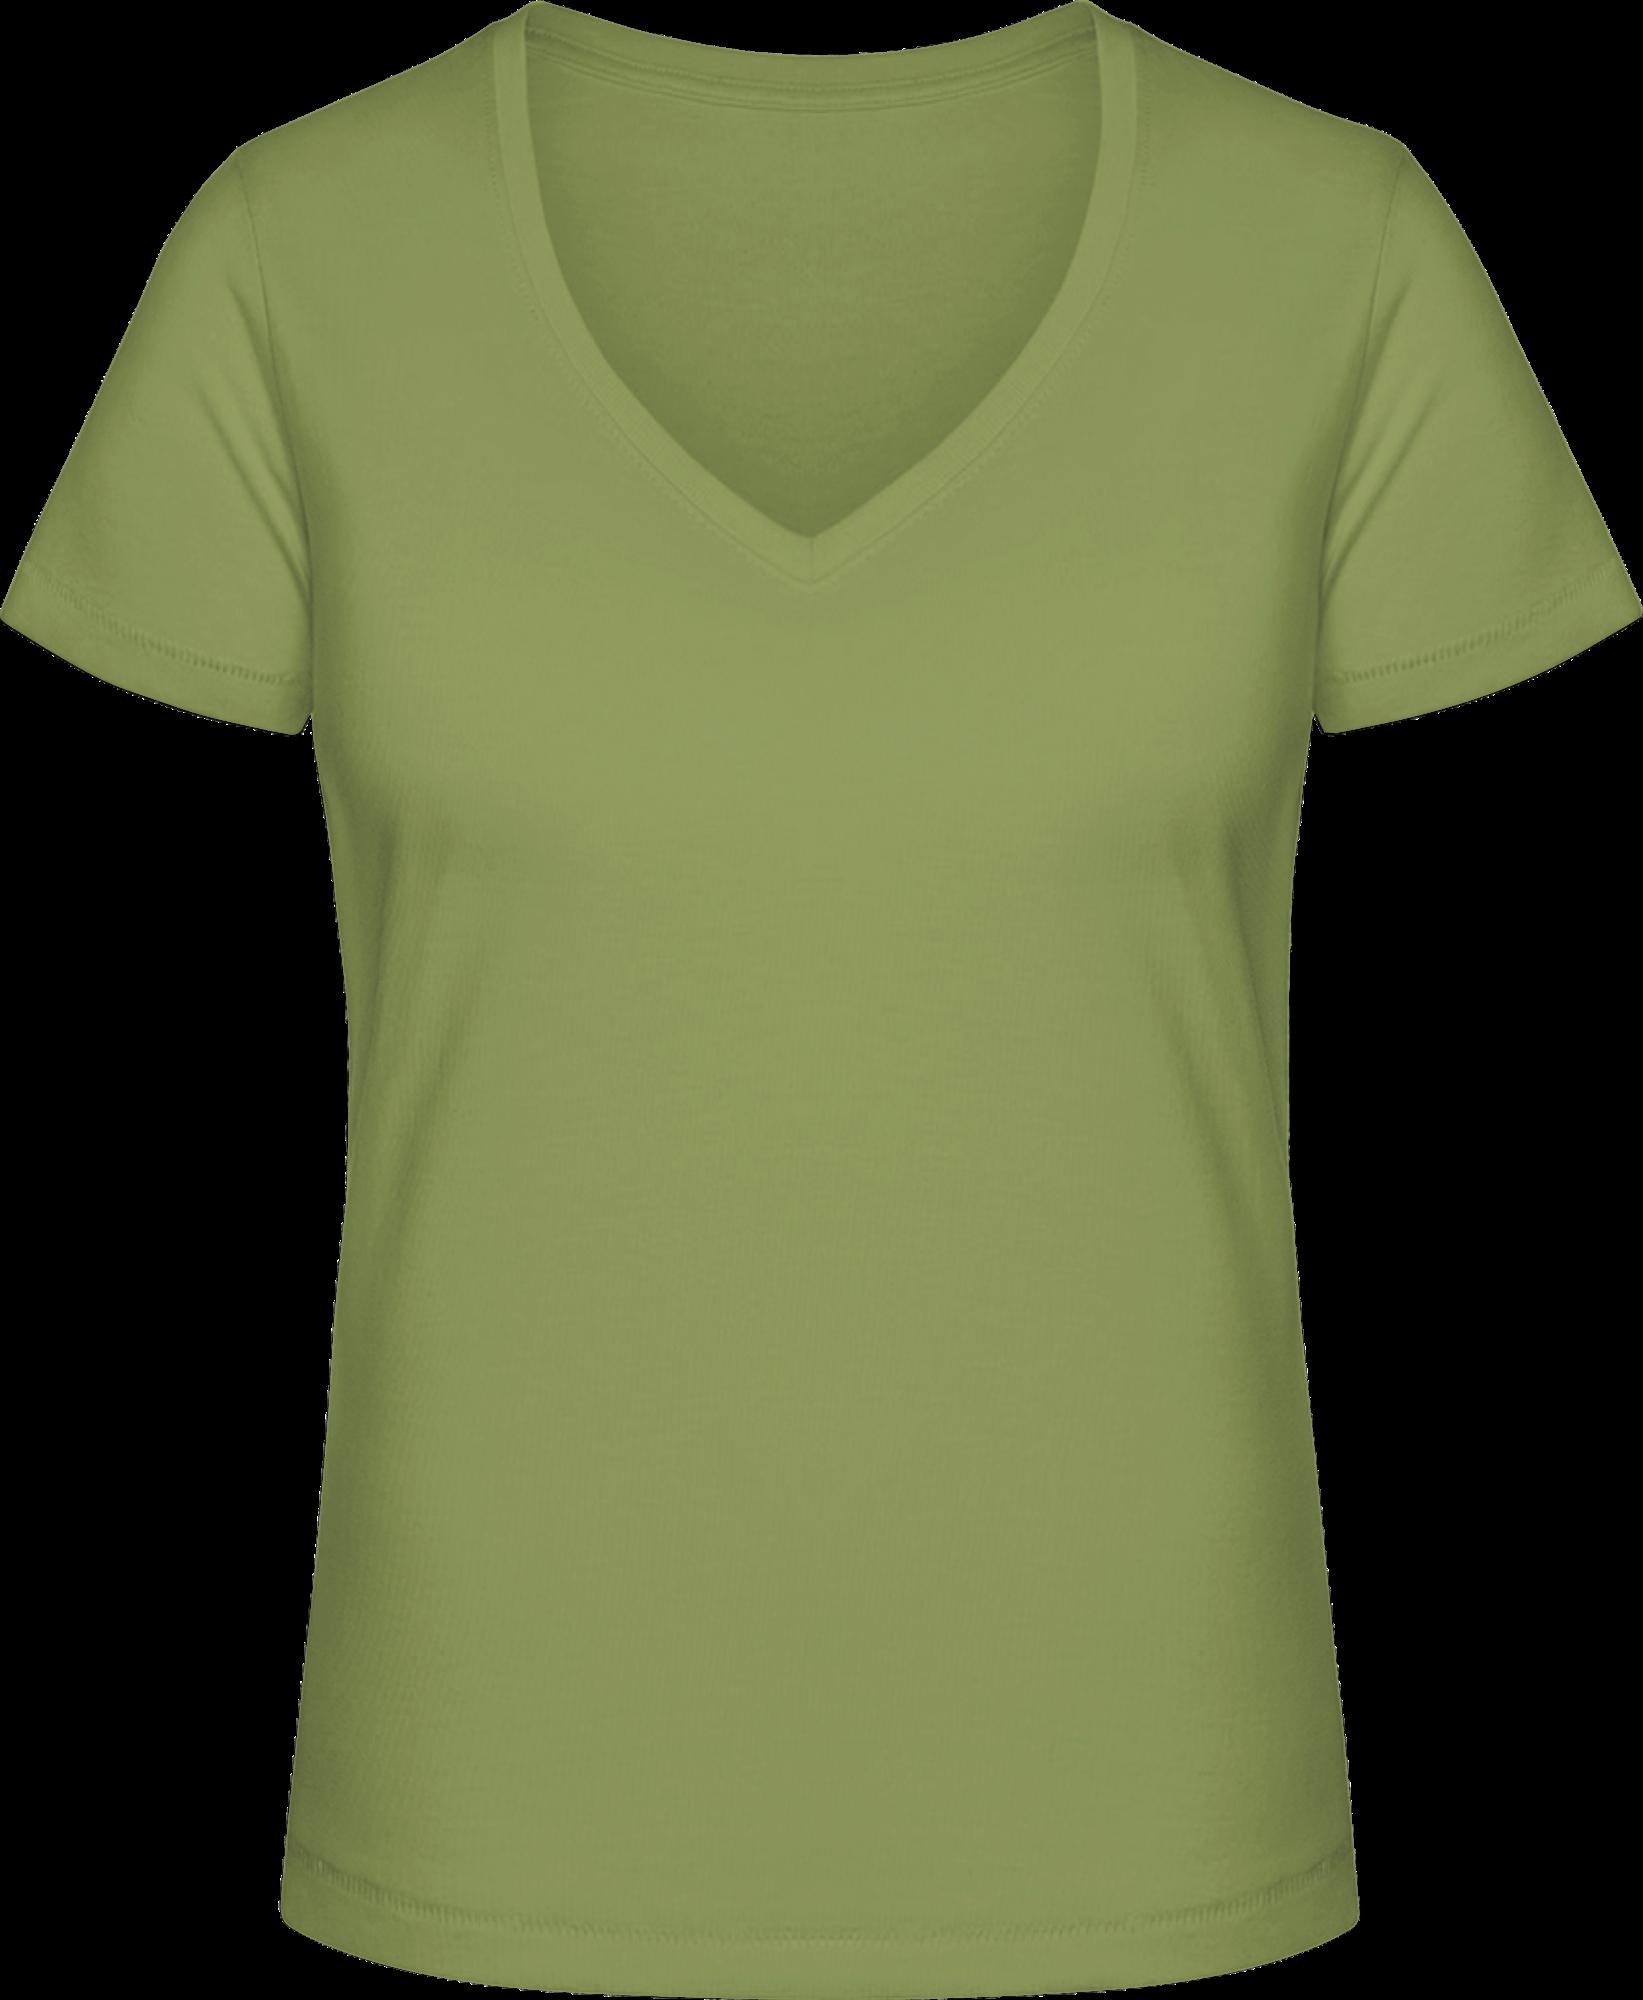 Dámske tričko V-výstrih Janet